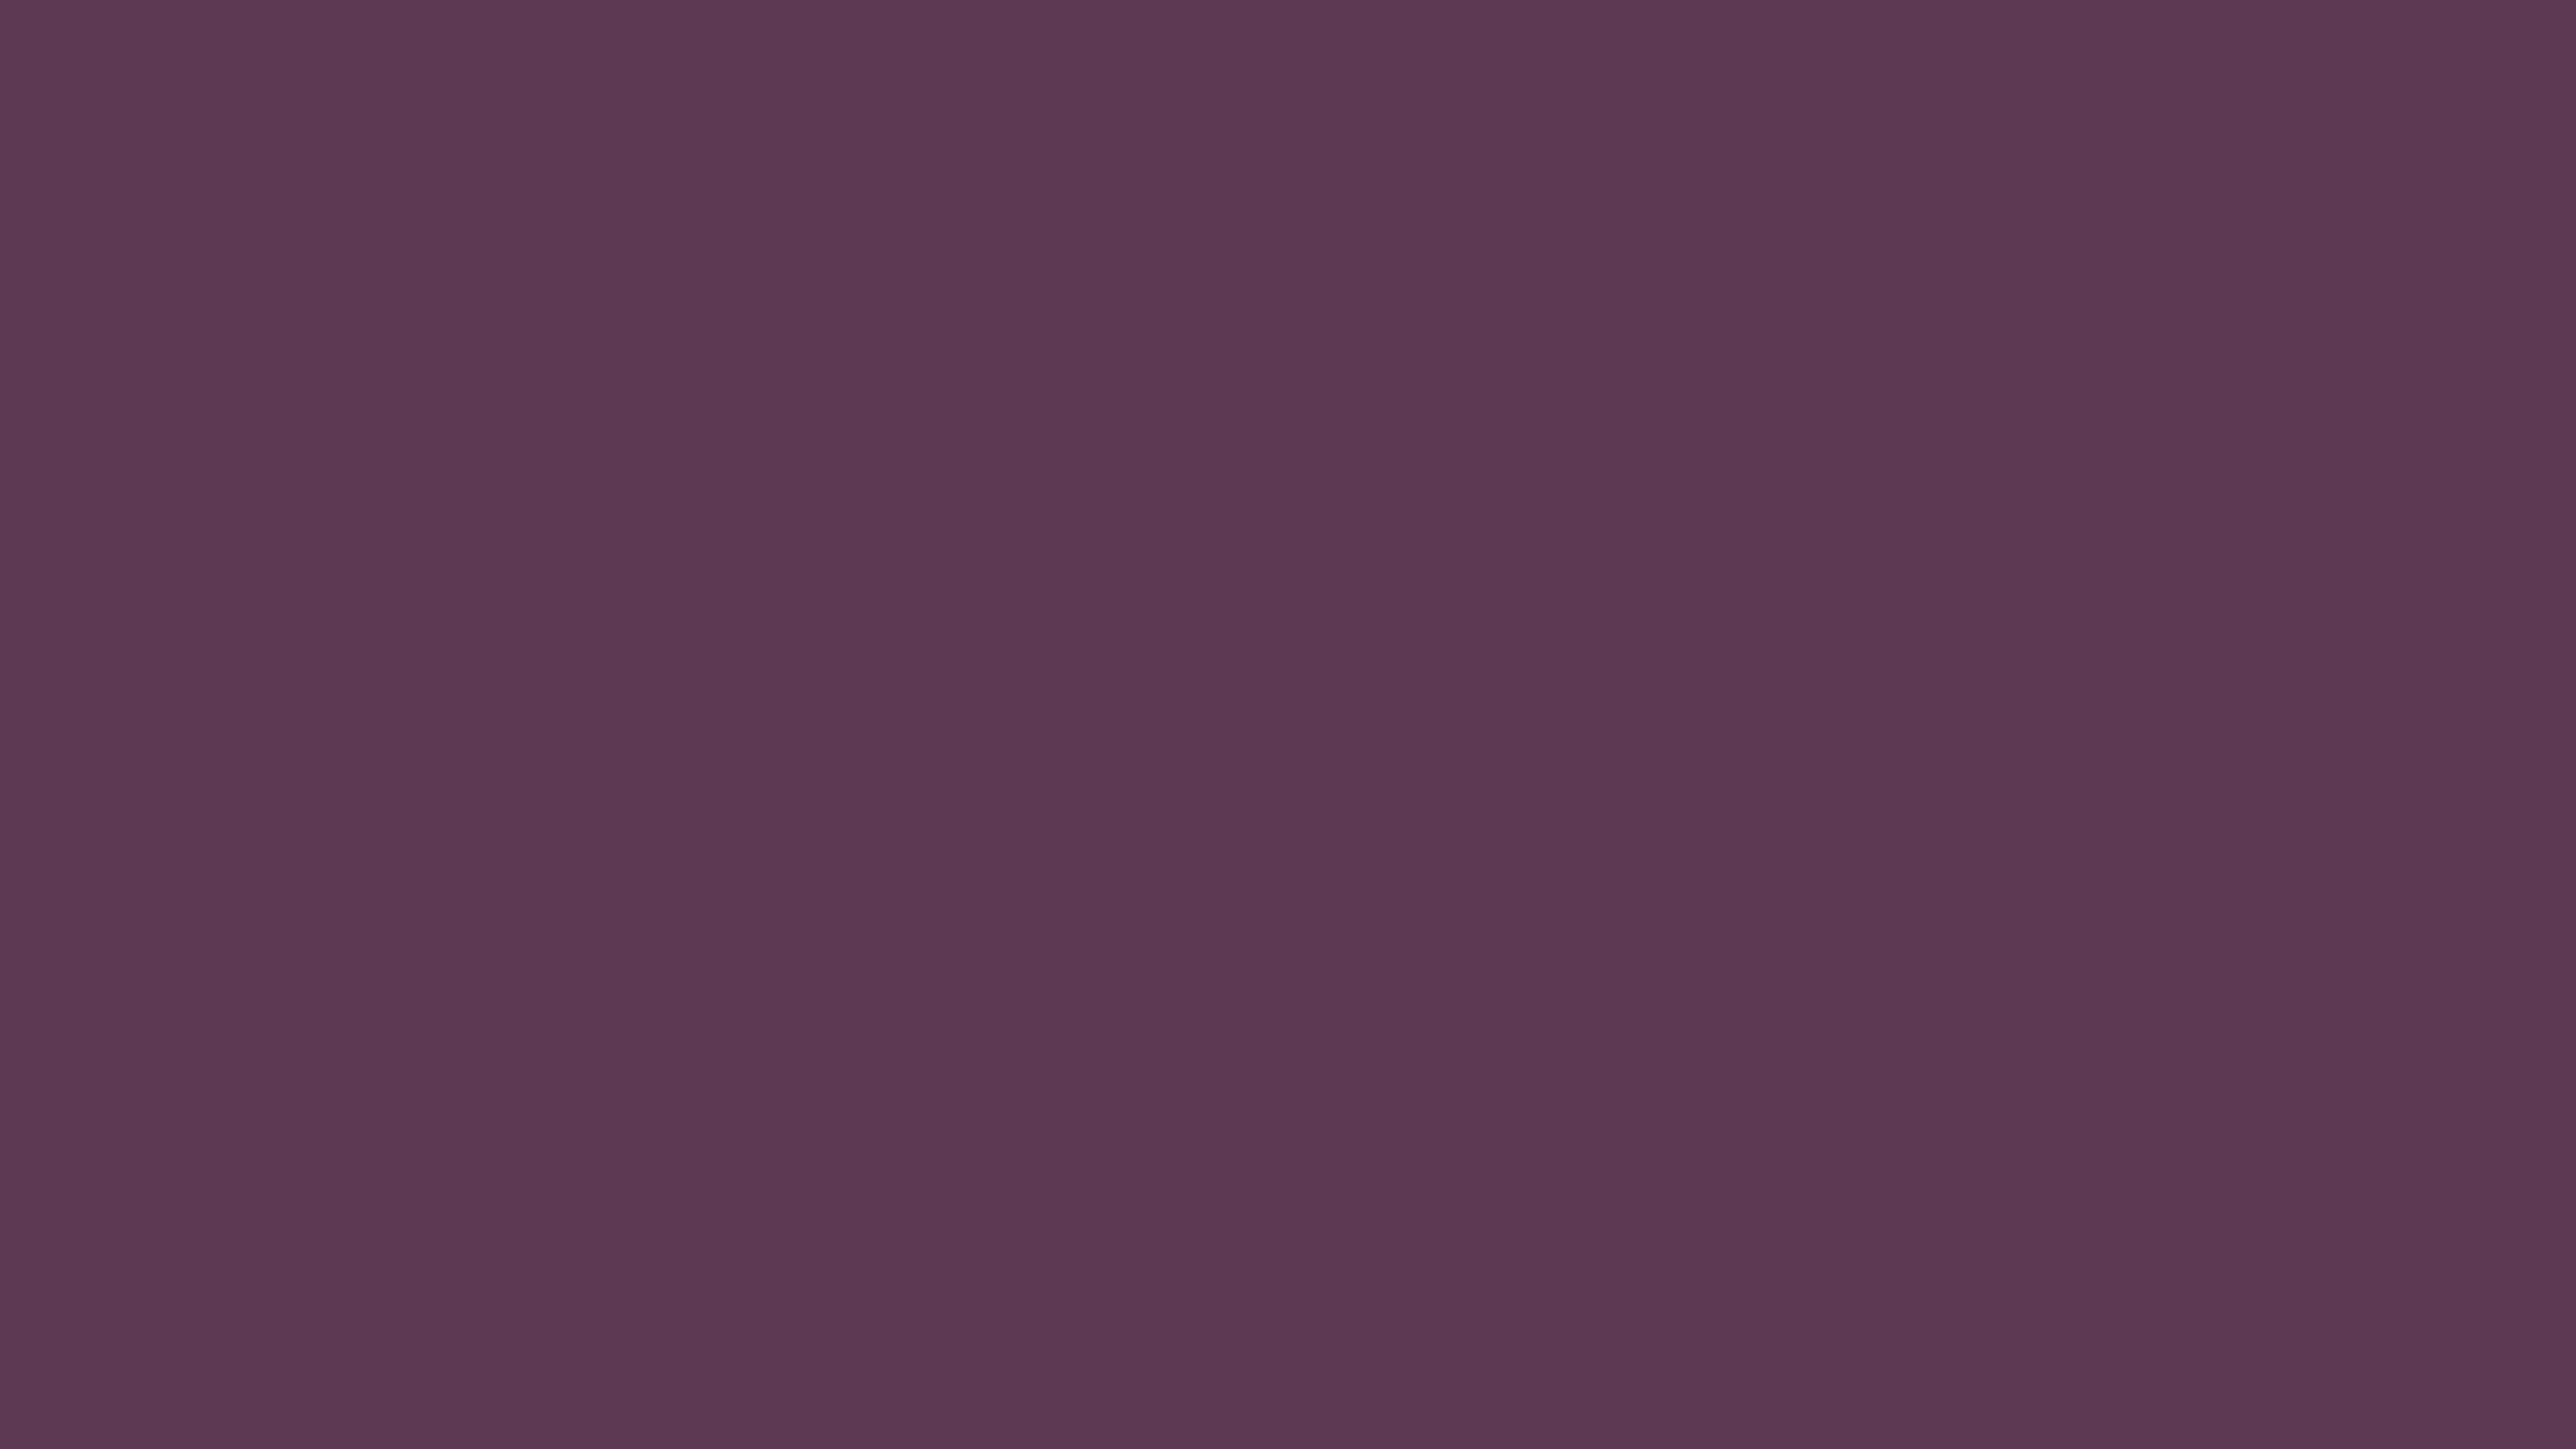 5120x2880 Dark Byzantium Solid Color Background